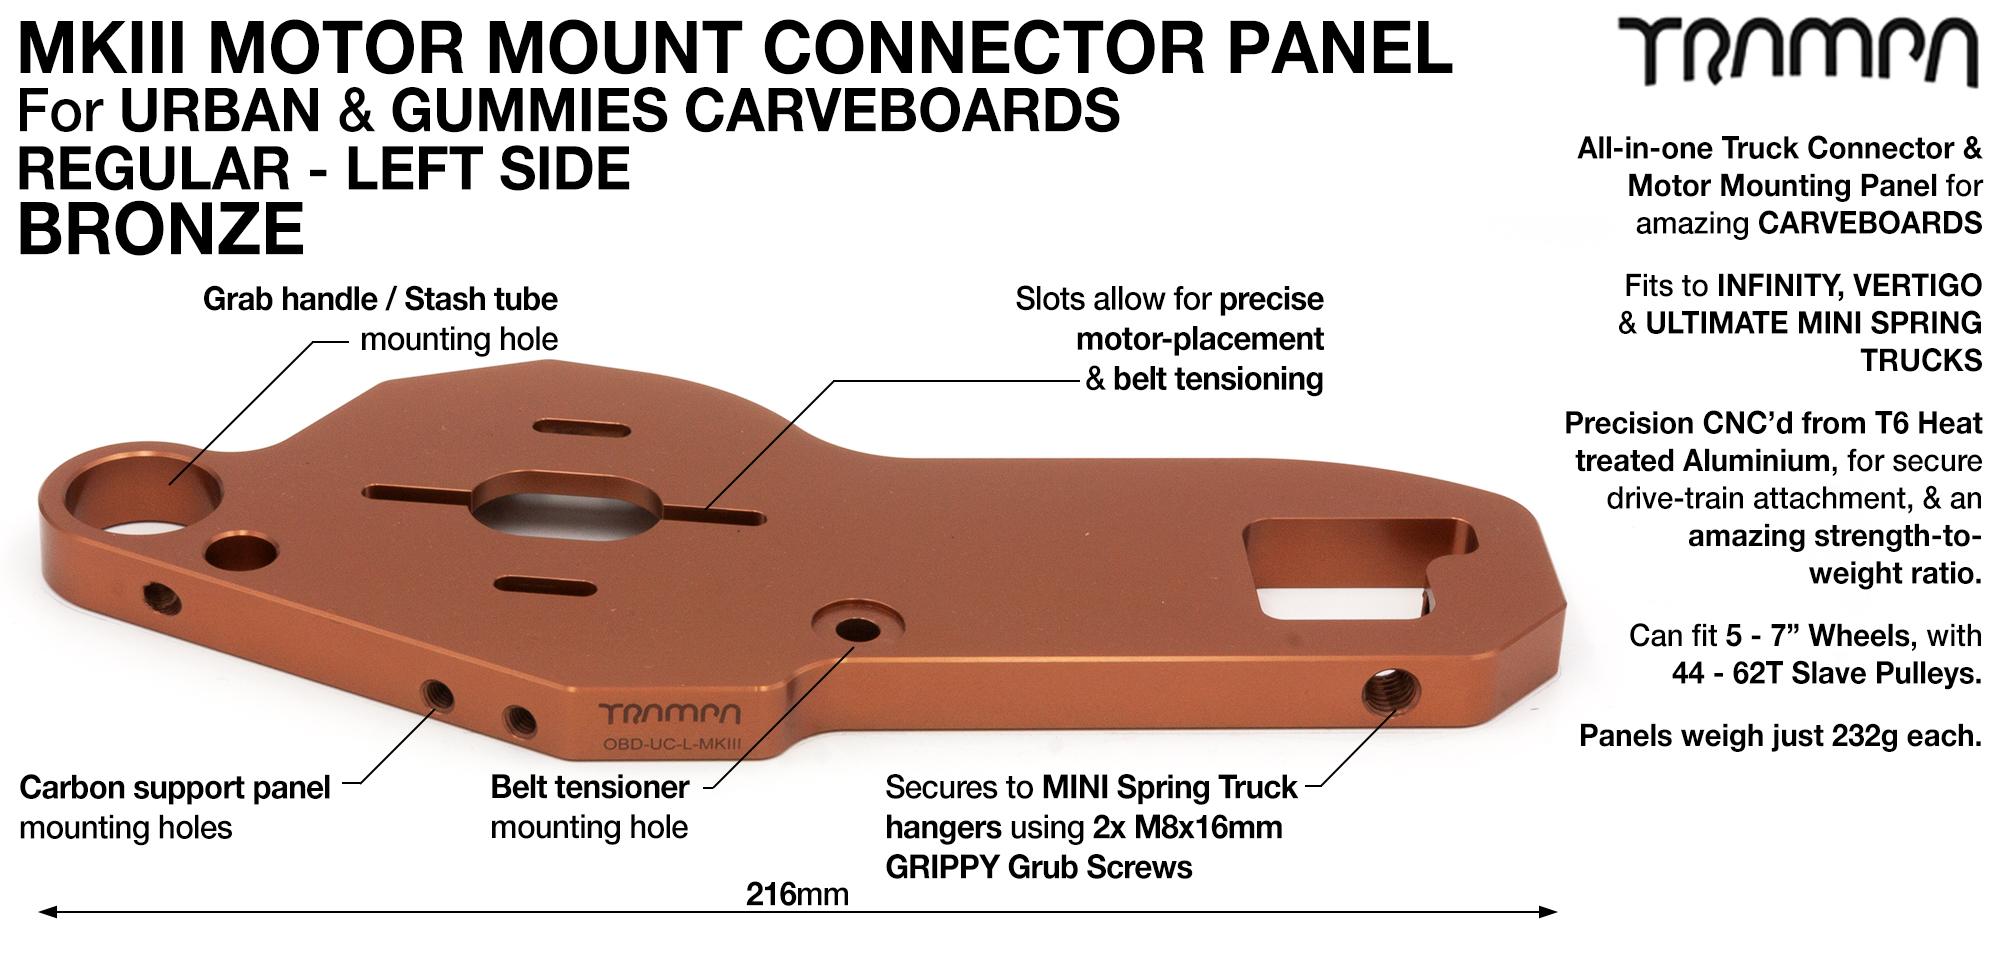 MkII URBAN CARVE Truck MOTOR MOUNT T6 Aluminium Anodised BRONZE - REGULAR